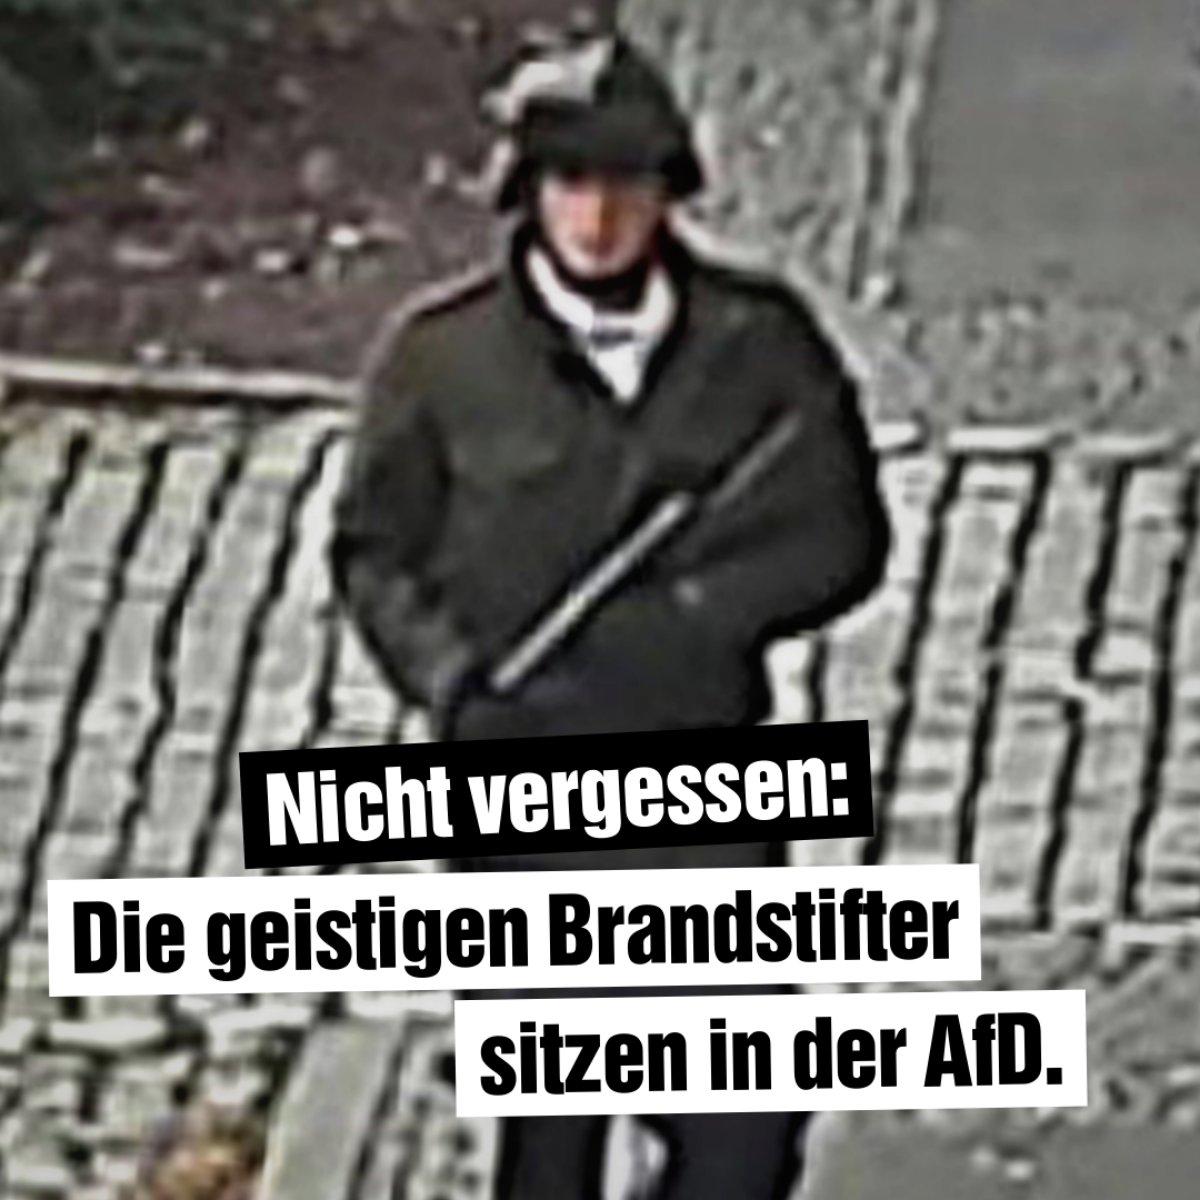 Lorenz Gösta Beutin on Twitter